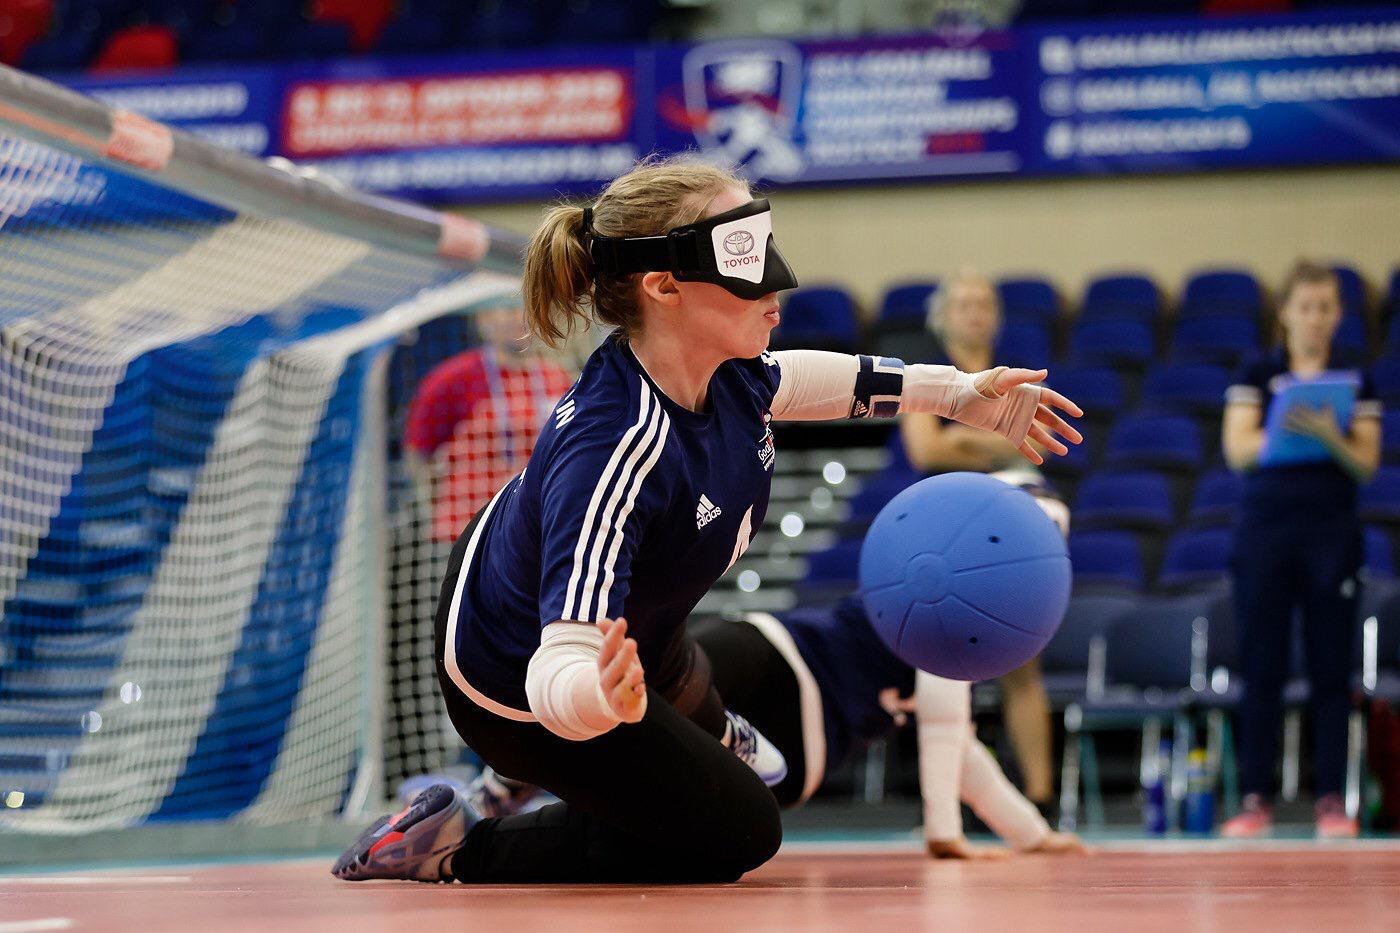 Female player saving the ball